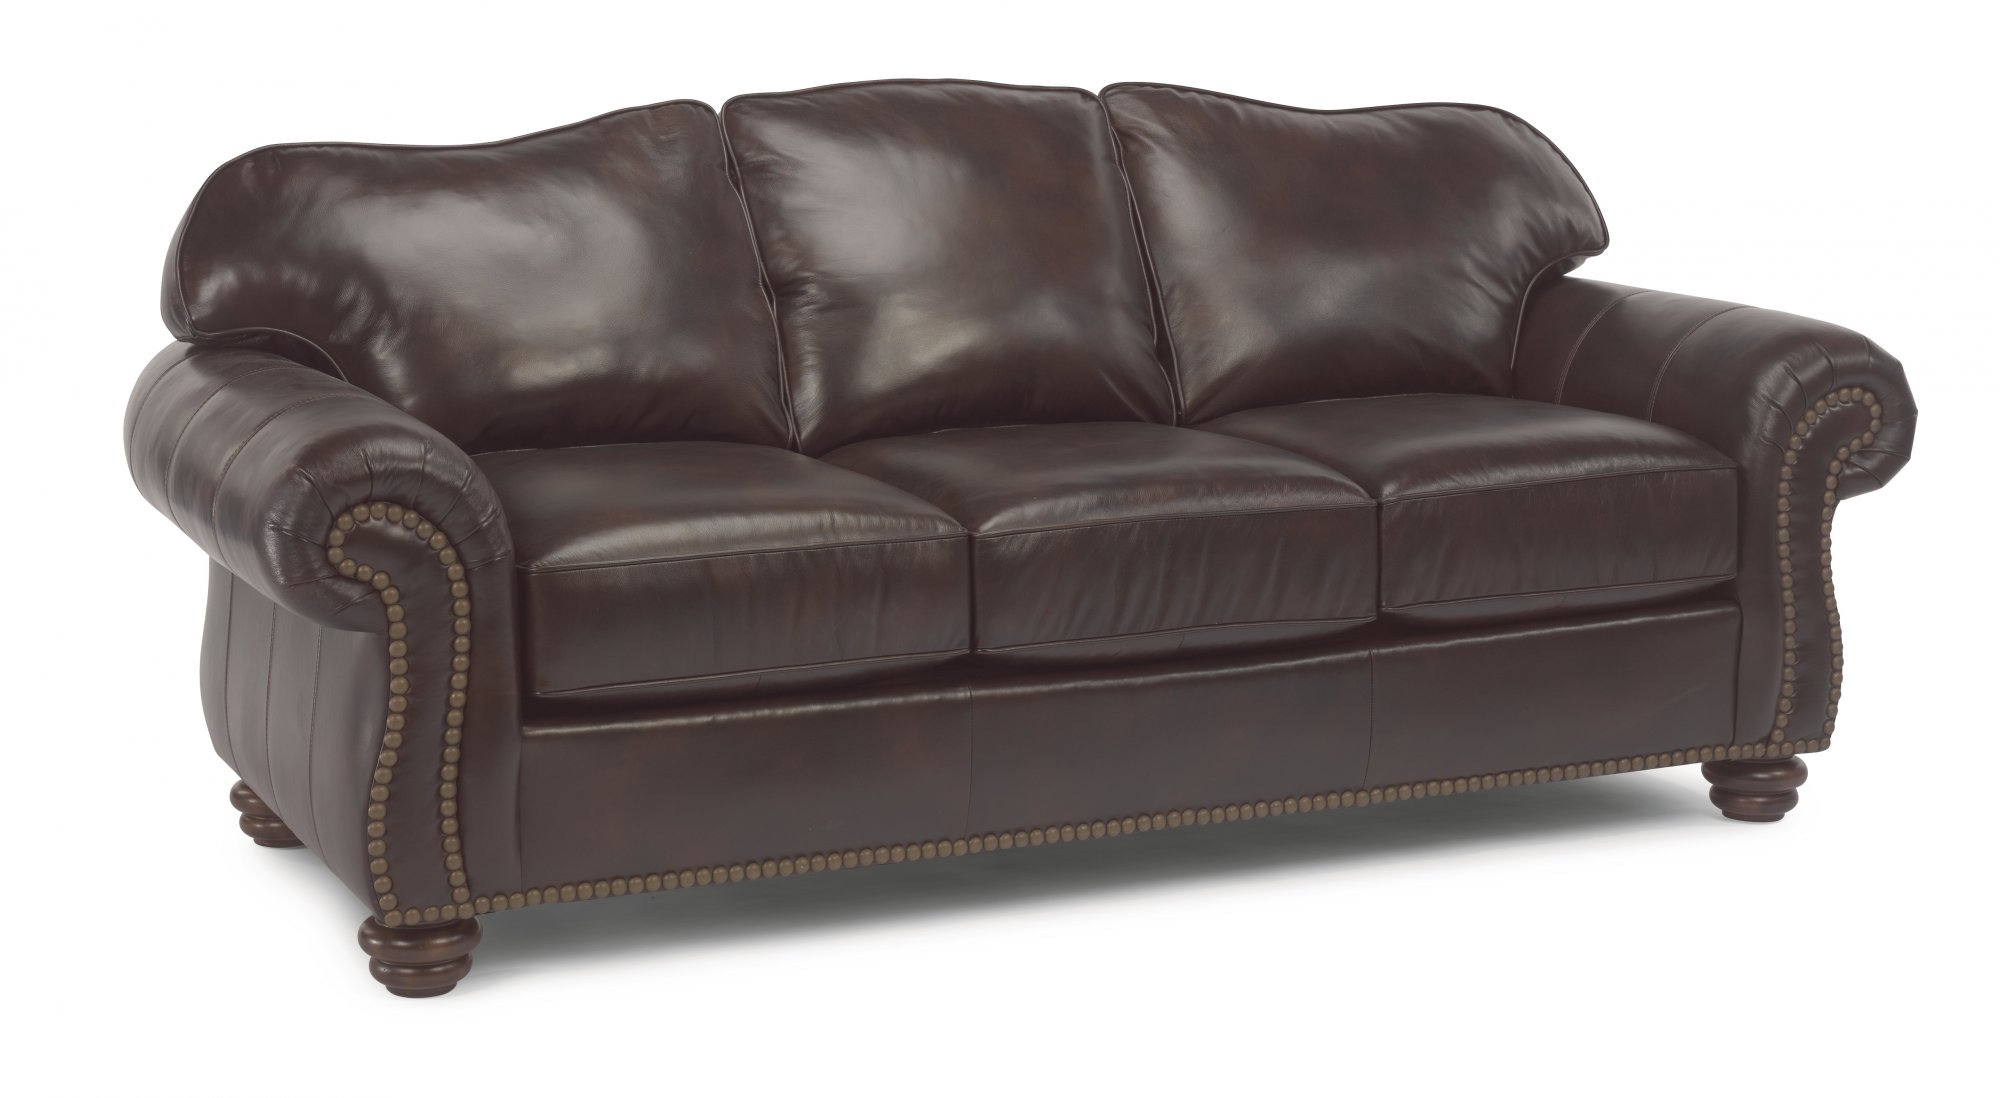 Admirable Flexsteel 3648 31 Bexley Leather Sofa With Nailhead Trim Theyellowbook Wood Chair Design Ideas Theyellowbookinfo